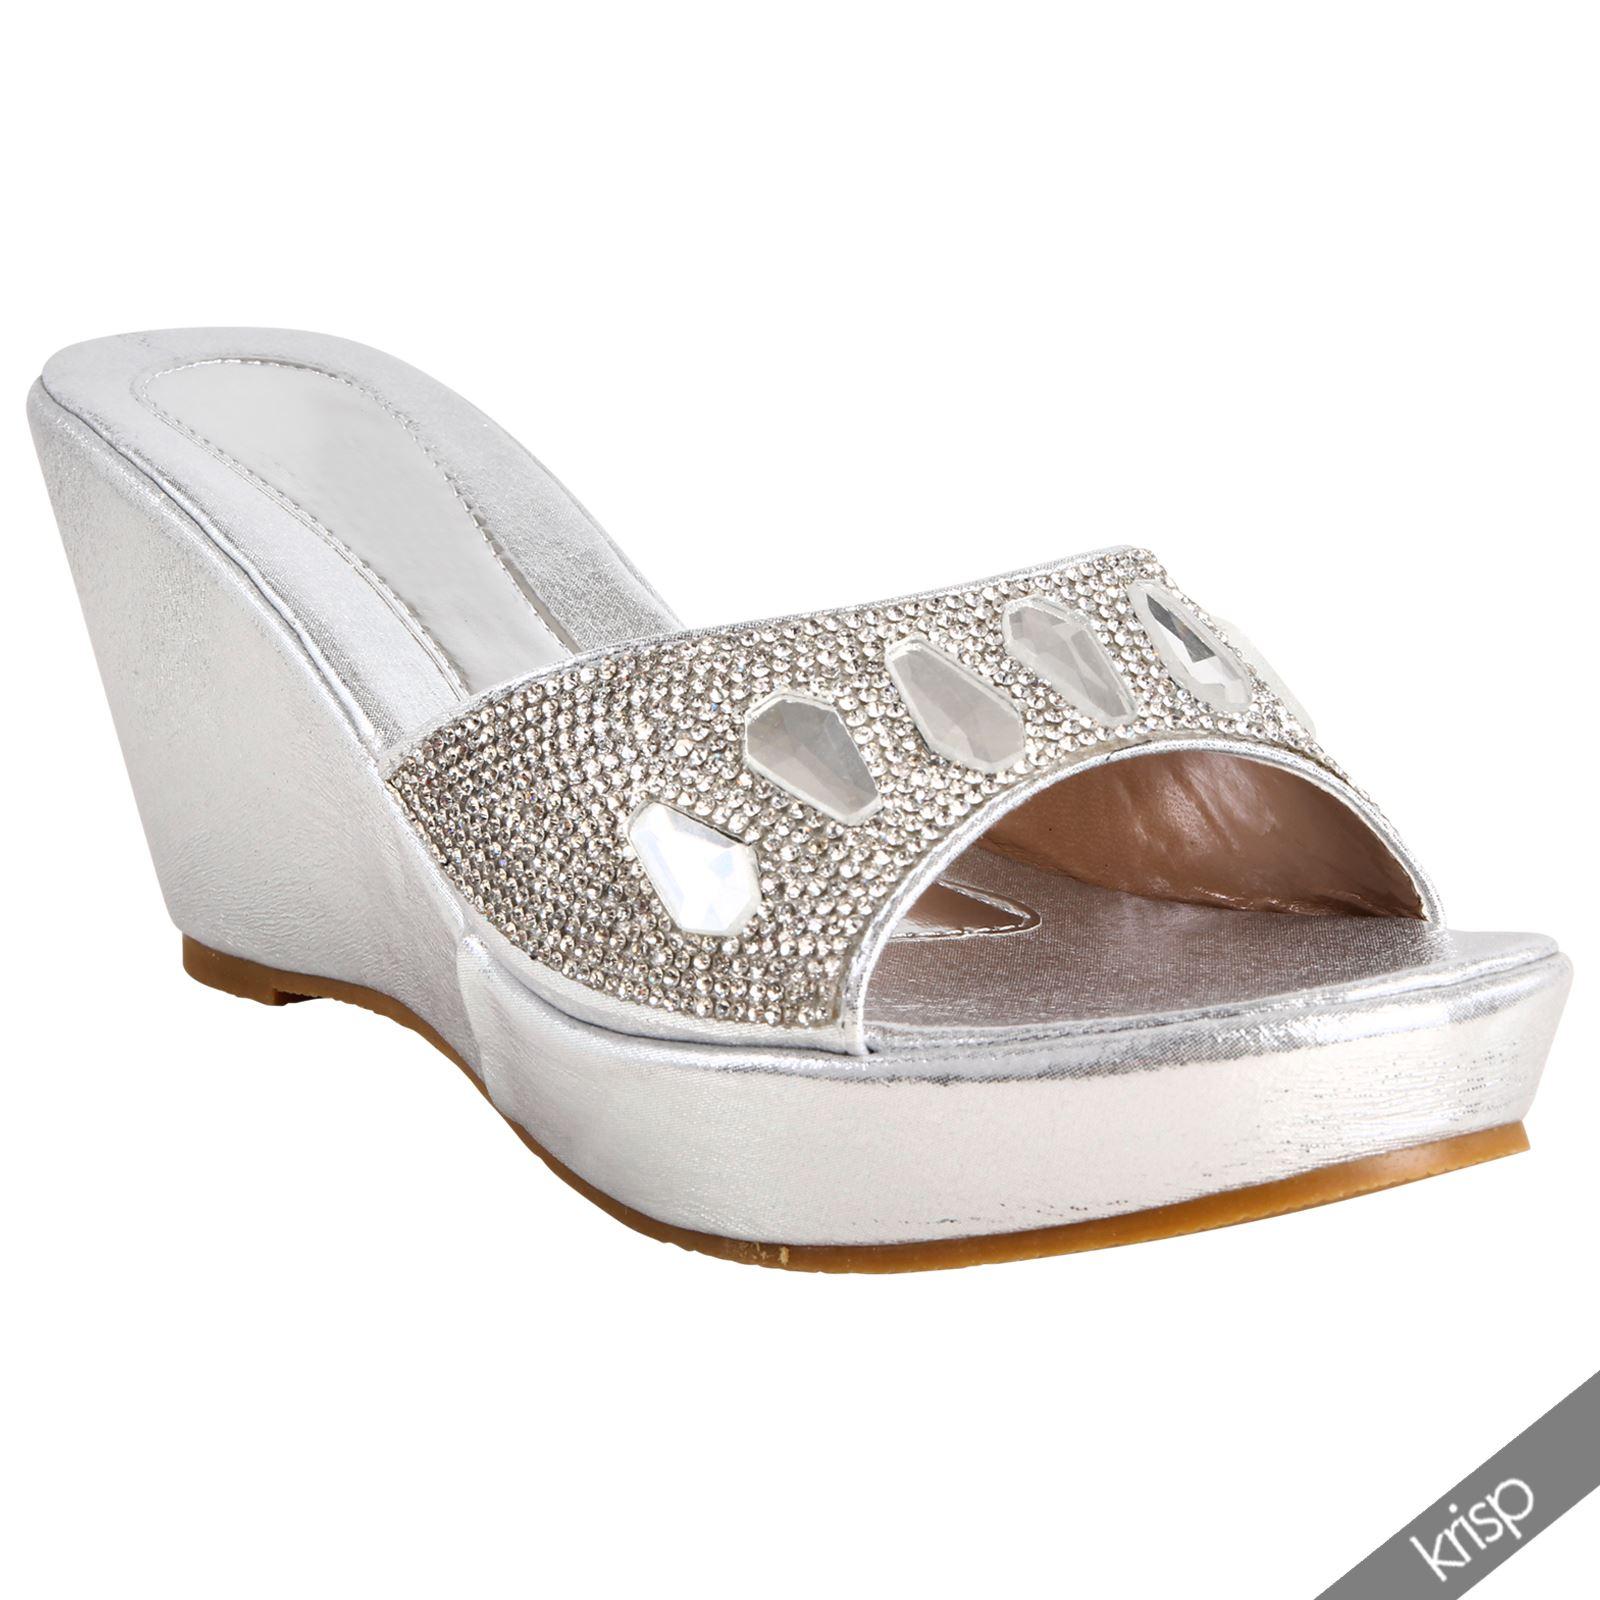 Glitter Wedge Heel Shoes